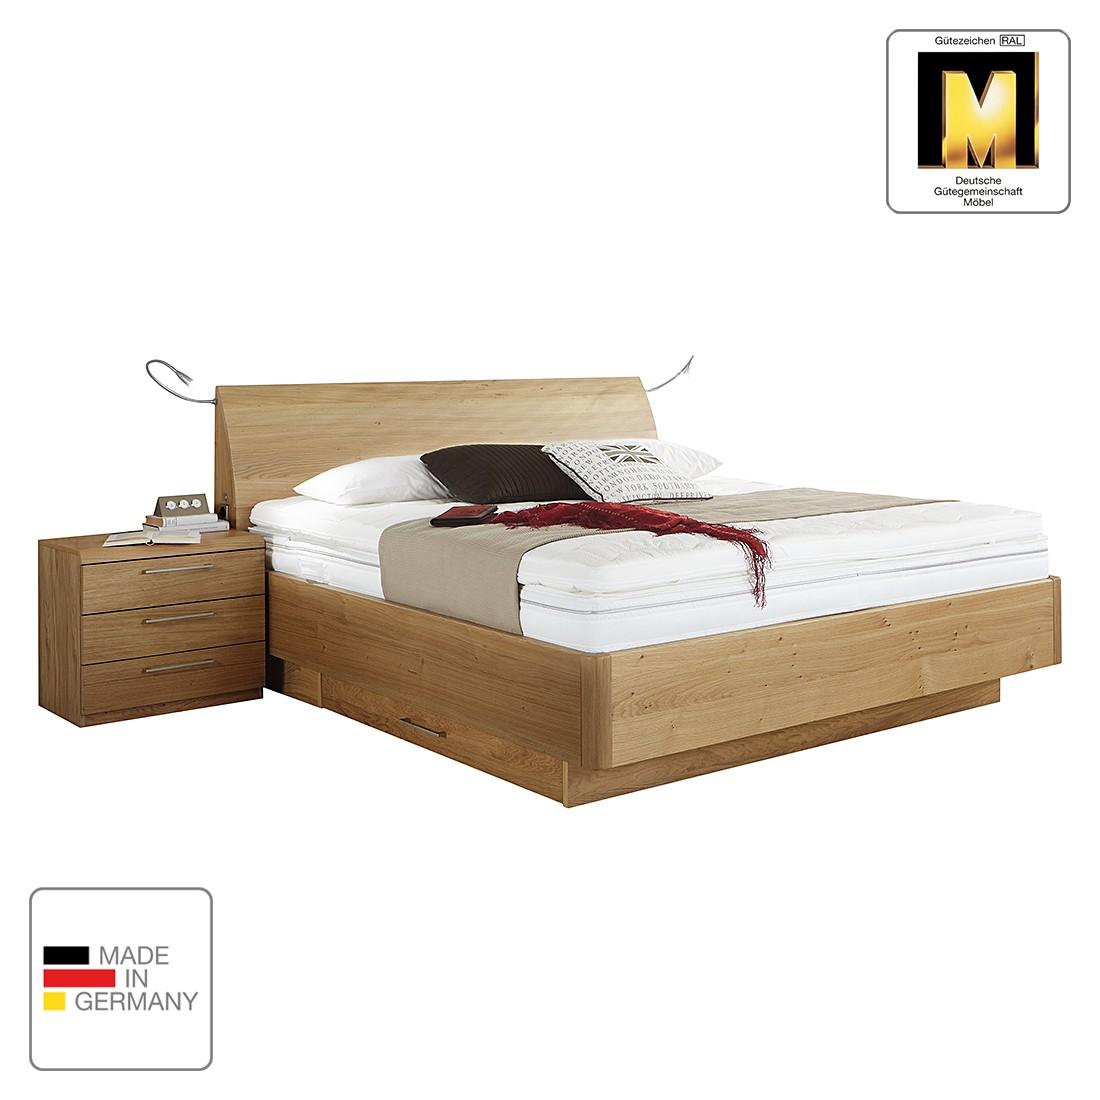 nachttisch mit led beleuchtung stunning tragbare mini eye. Black Bedroom Furniture Sets. Home Design Ideas